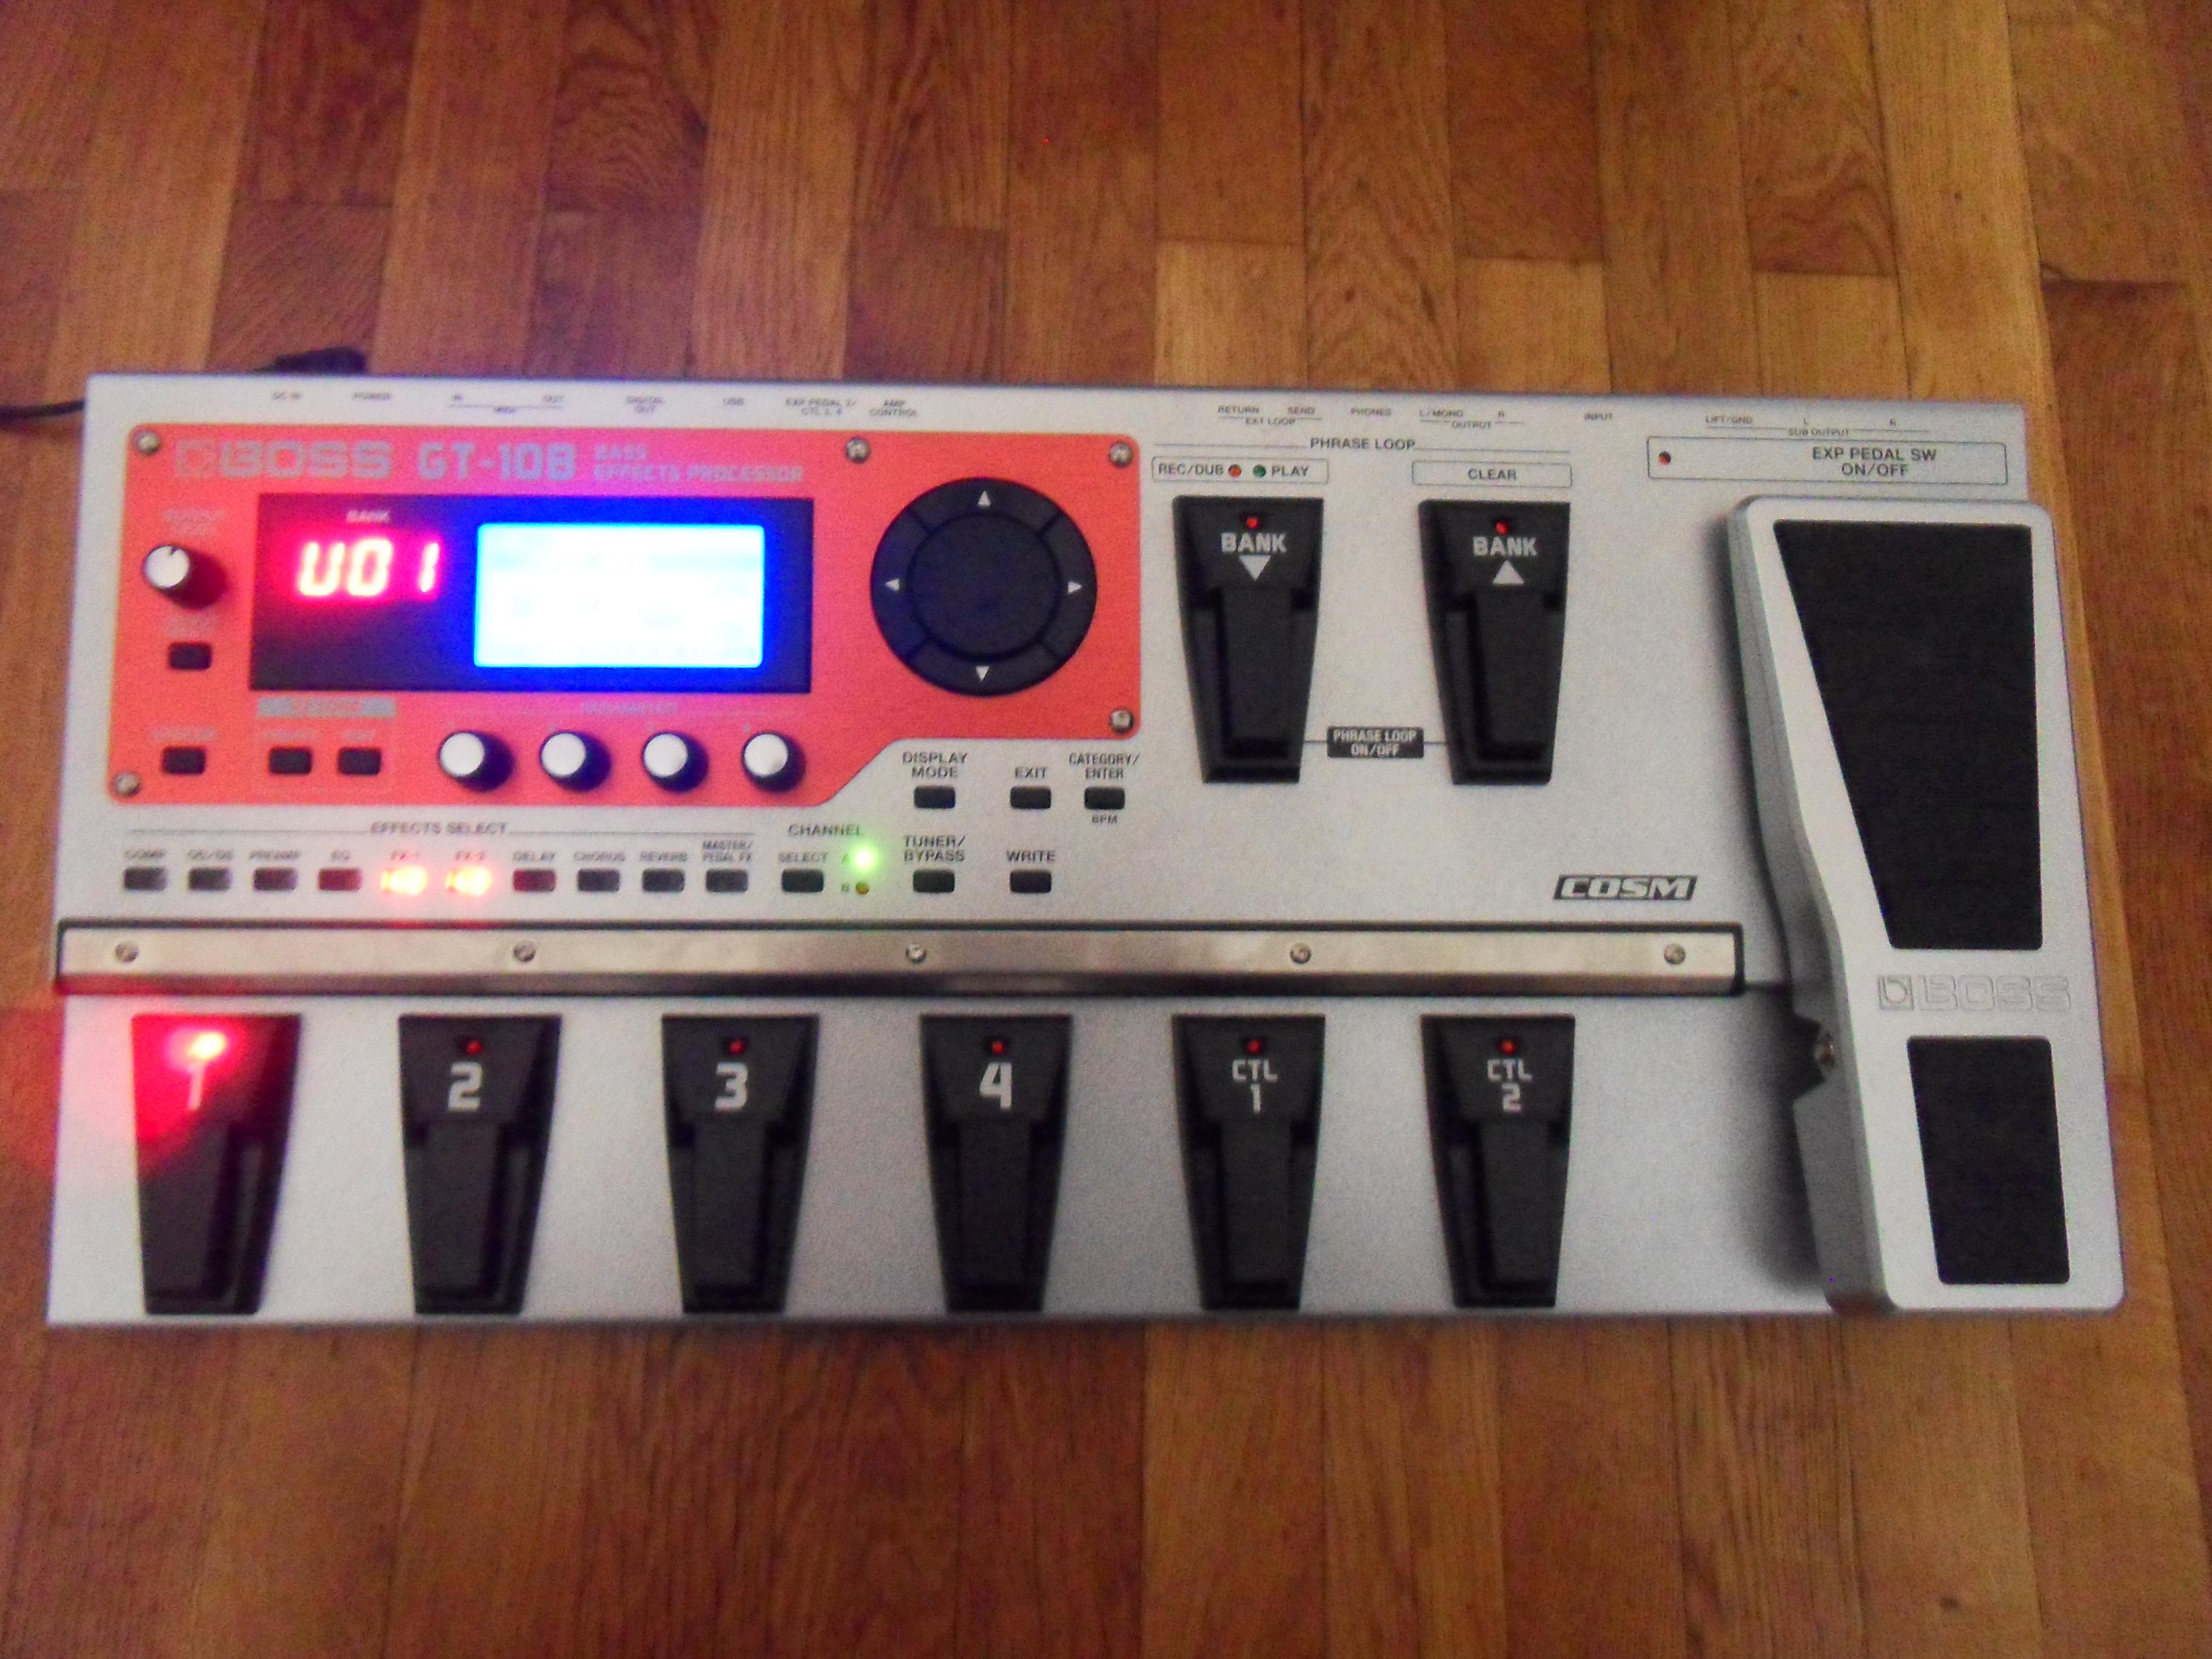 boss gt 10b image 599476 audiofanzine rh en audiofanzine com gt-10b manual pdf gt-10b manual